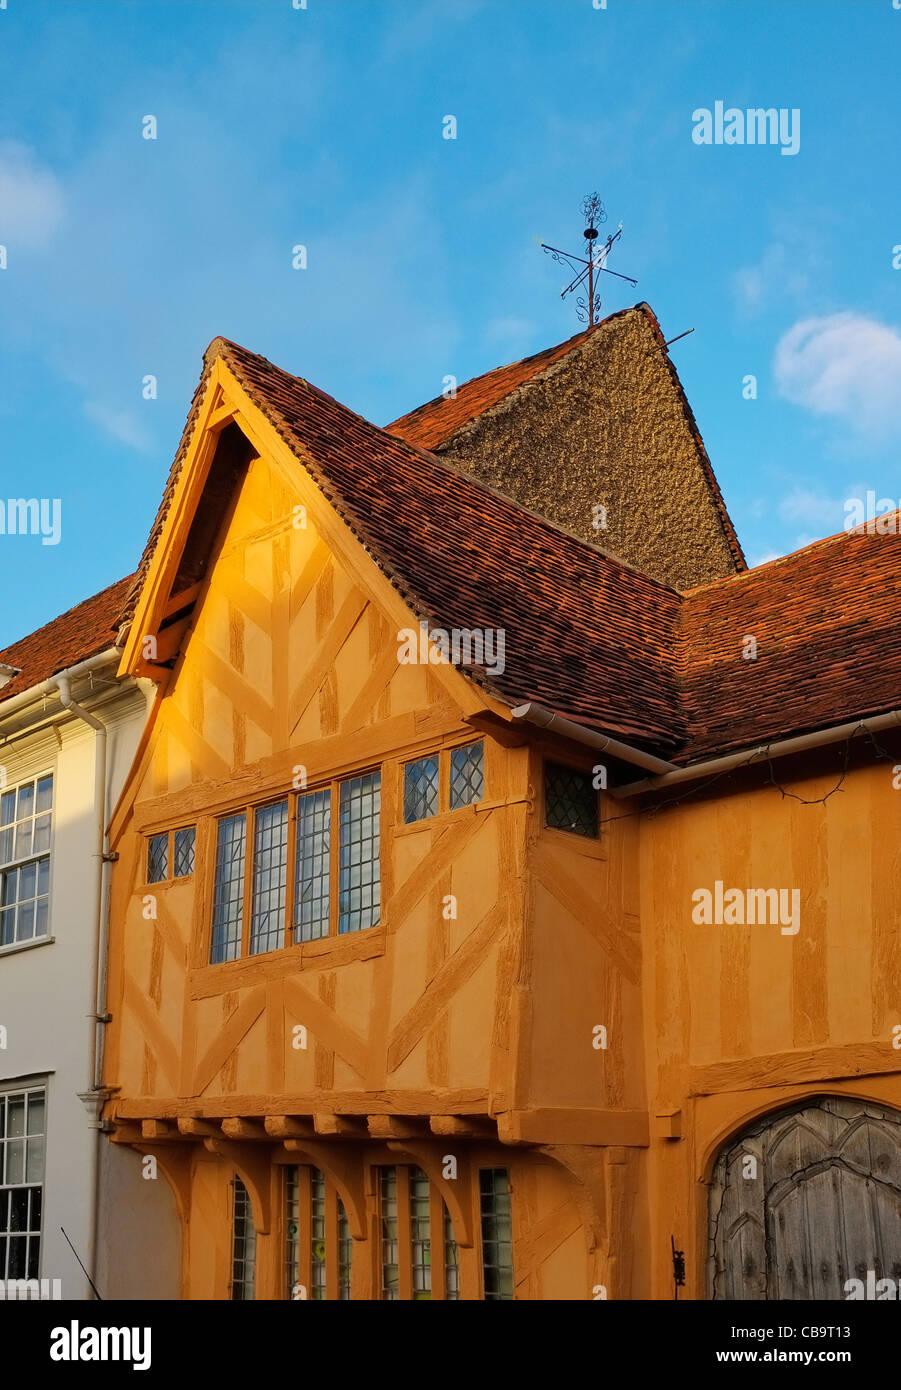 Medieval Houses, Lavenham, Suffolk. - Stock Image